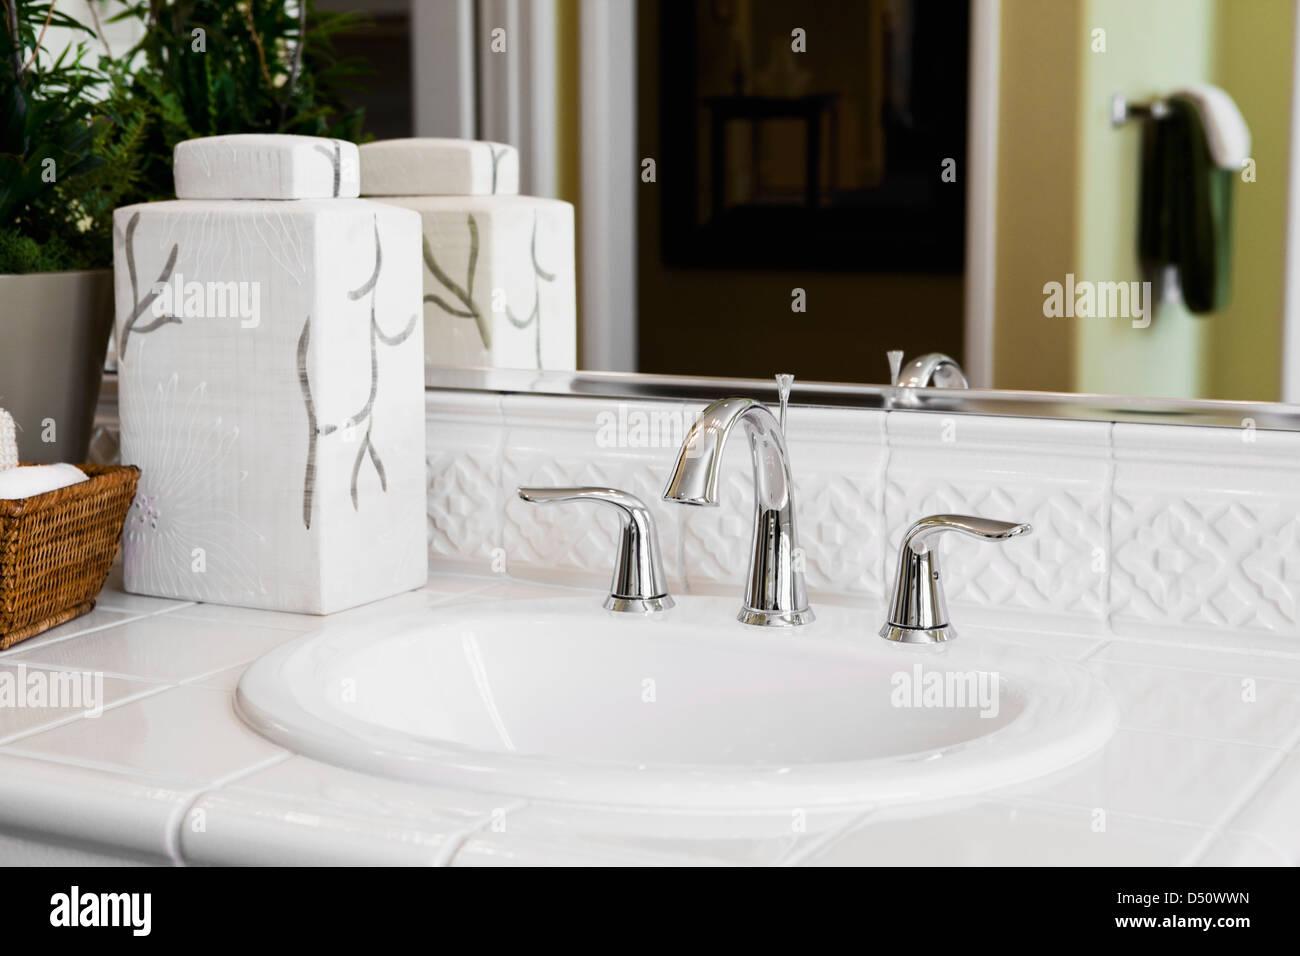 White Tile Countertop Surrounding Bathroom Sink Tustin California Stock Photo Alamy